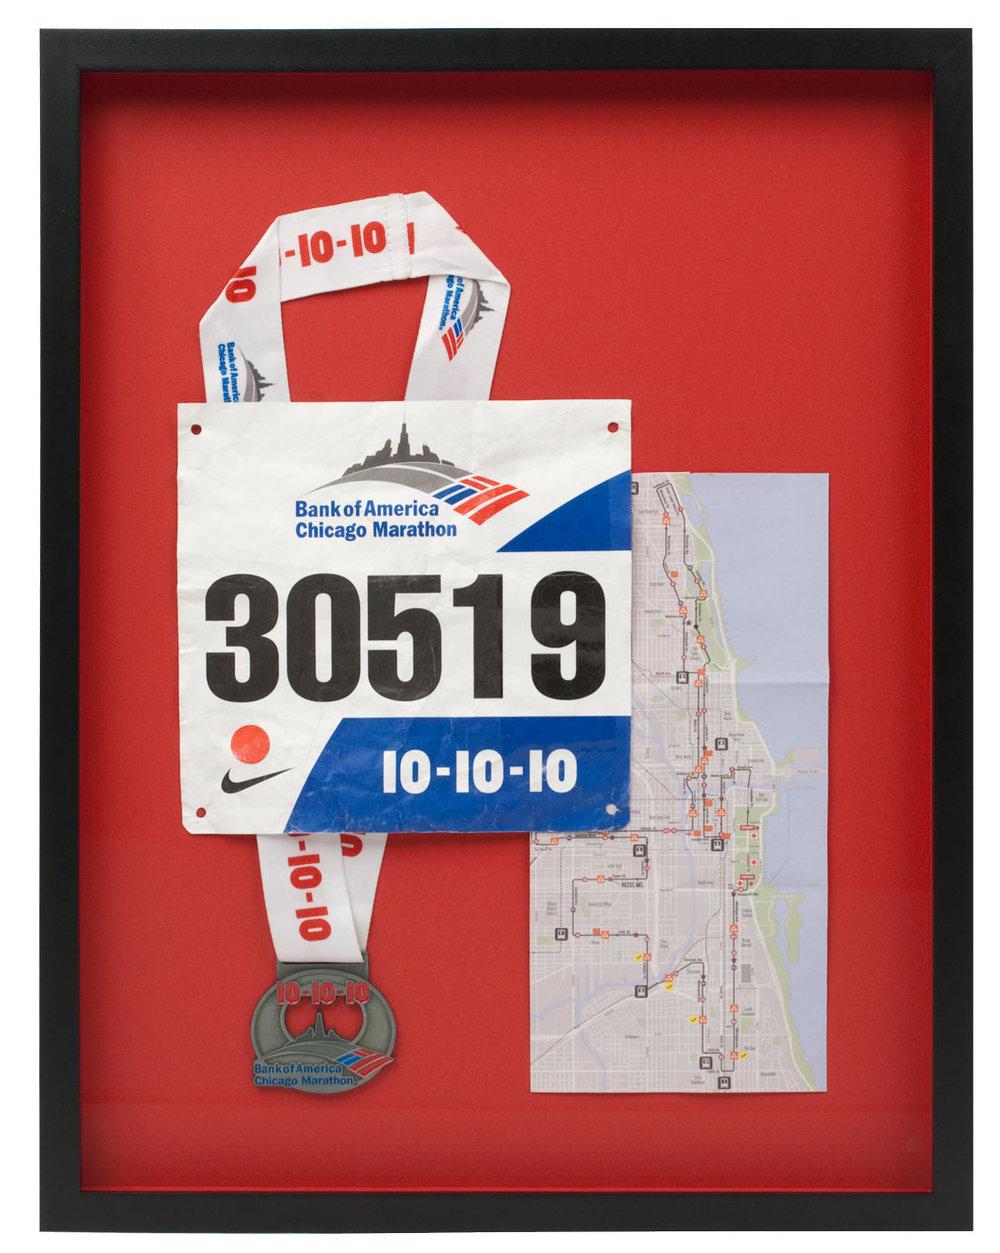 marathonrace_web.jpg